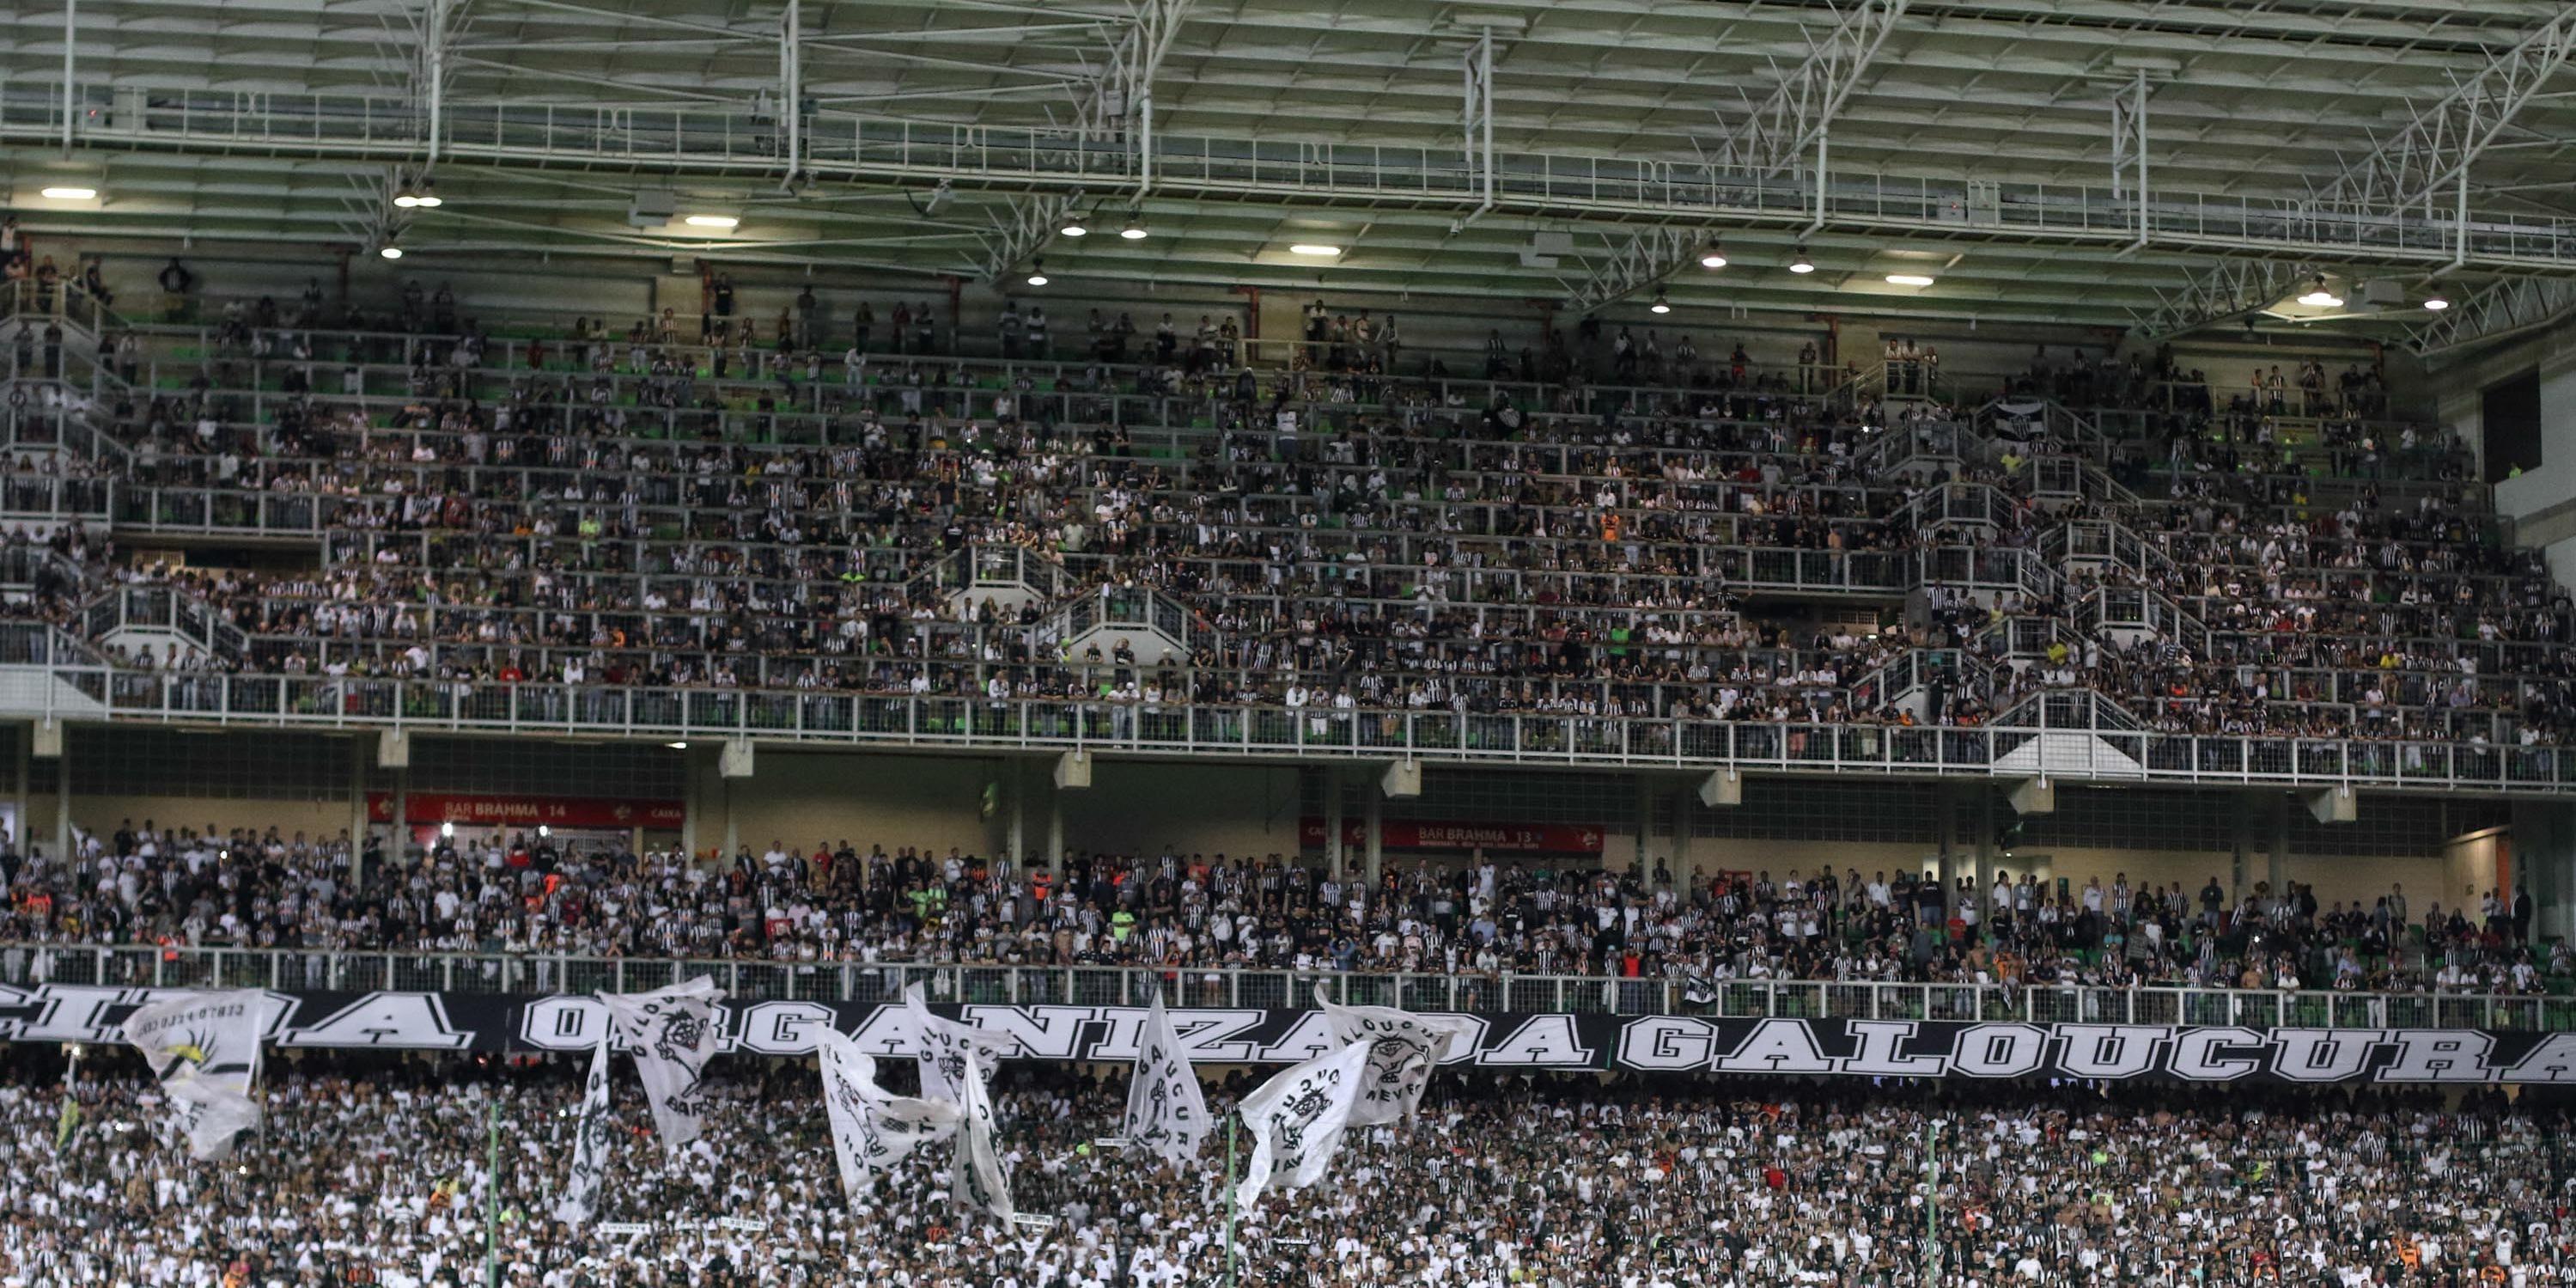 Torcida Atlético